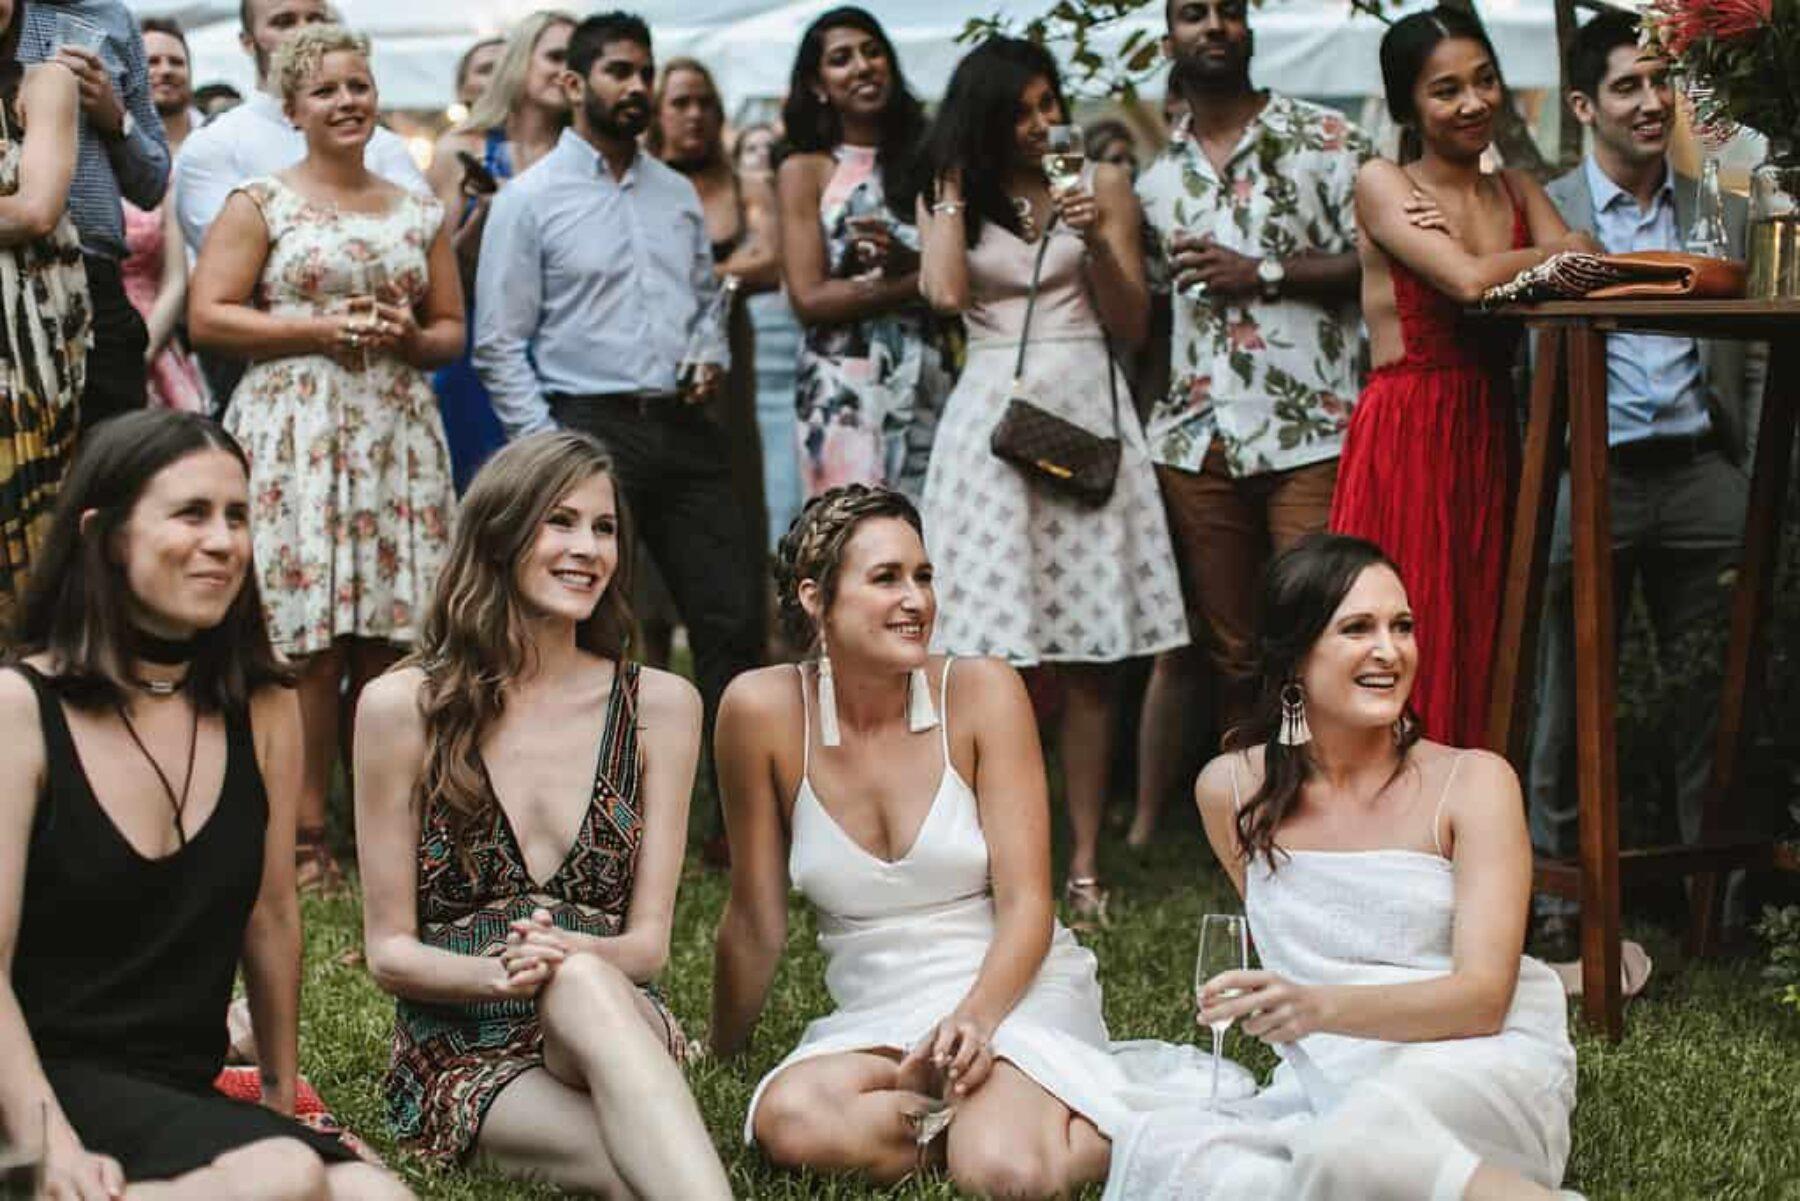 boho backyard wedding in Kangaroo Valley NSW - photography by Jimmy Raper